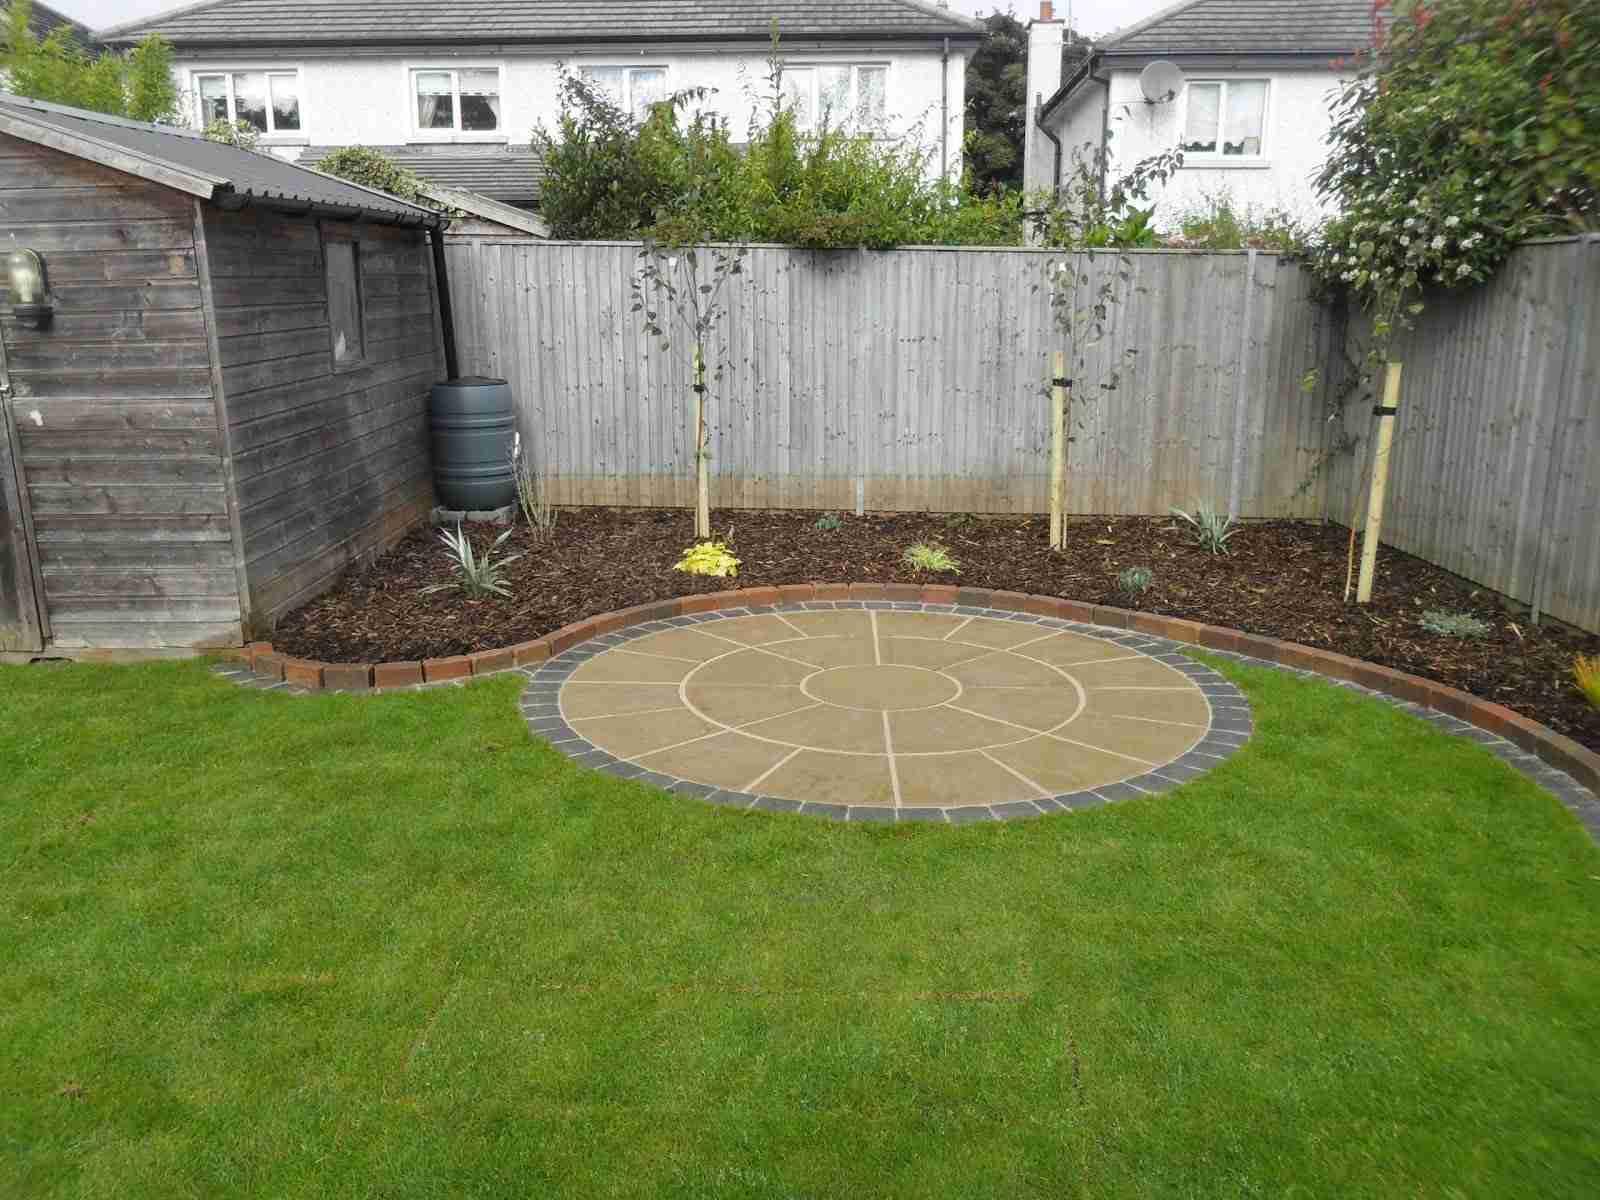 Circular Patio,Raised Patio Garden Design, Roschoill ... on Raised Garden Patio Ideas id=52136